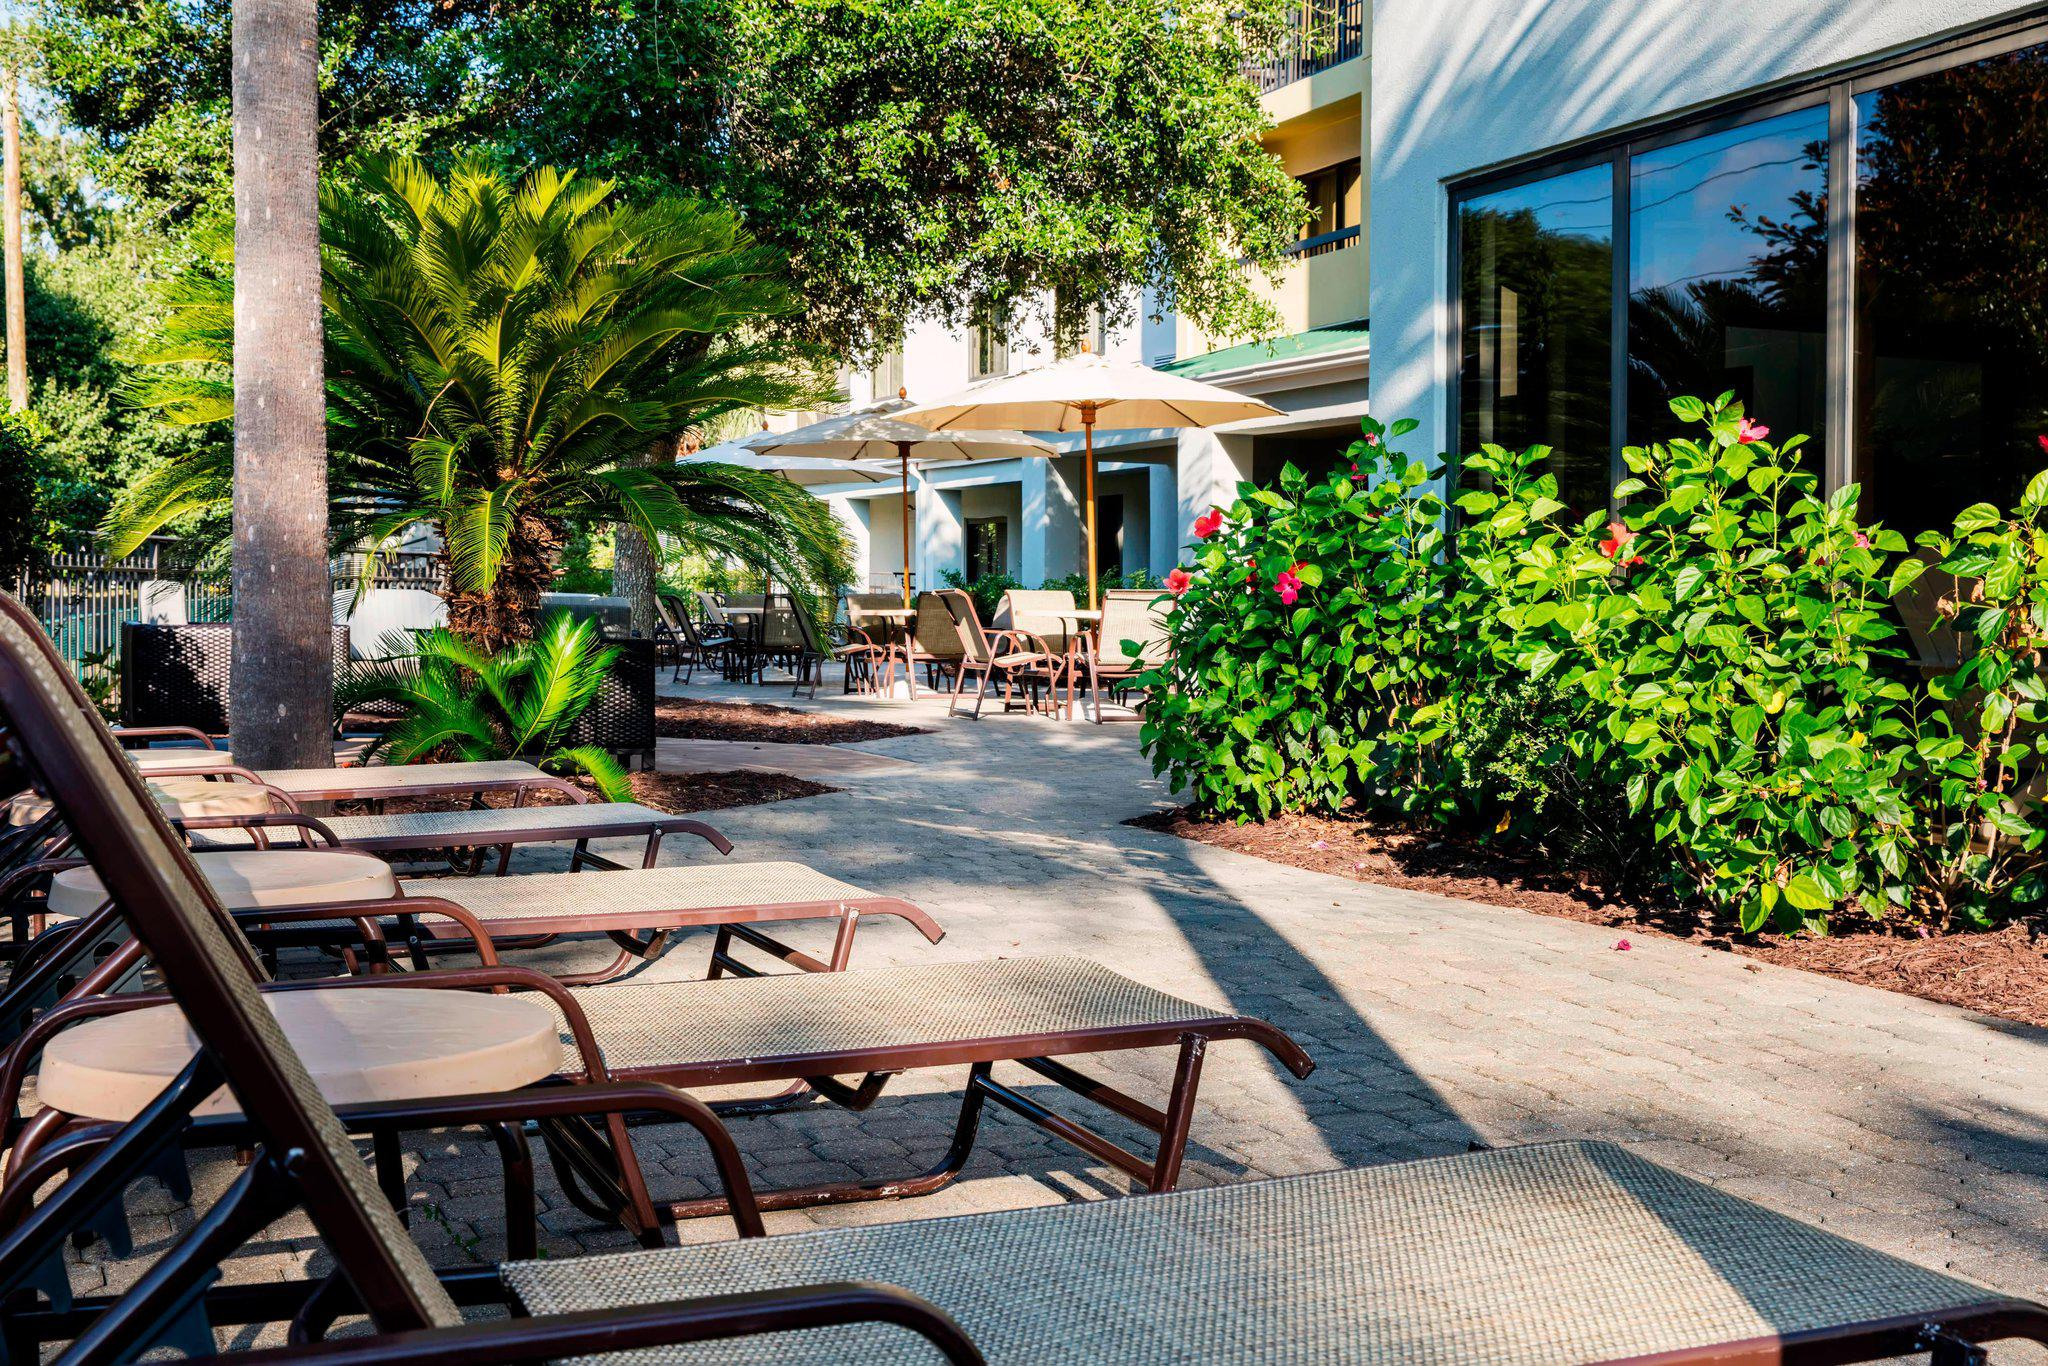 Courtyard by Marriott Myrtle Beach Barefoot Landing